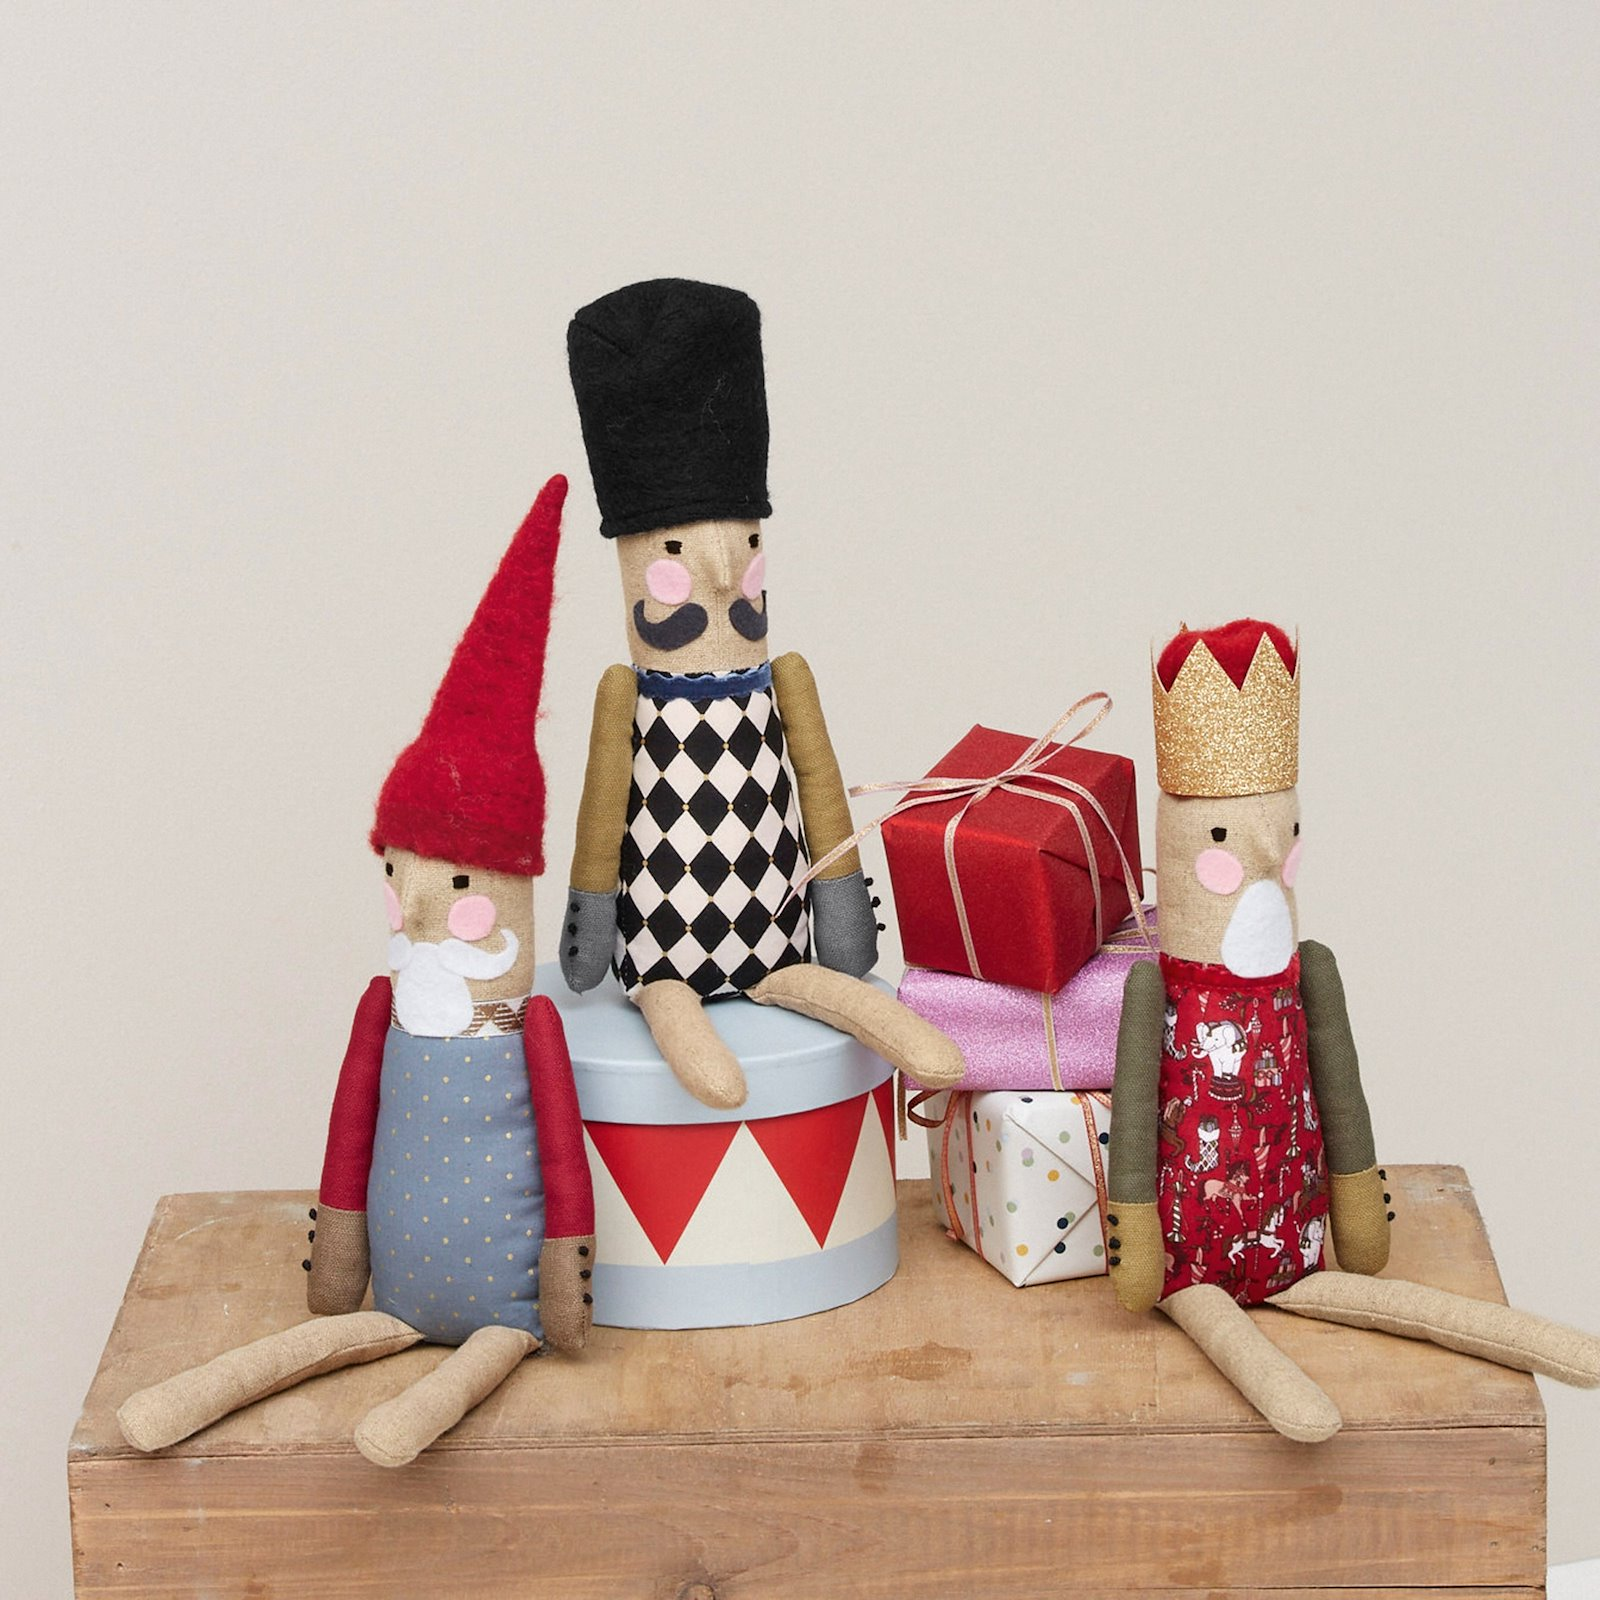 Gnome and nutcracker p90345_bundle